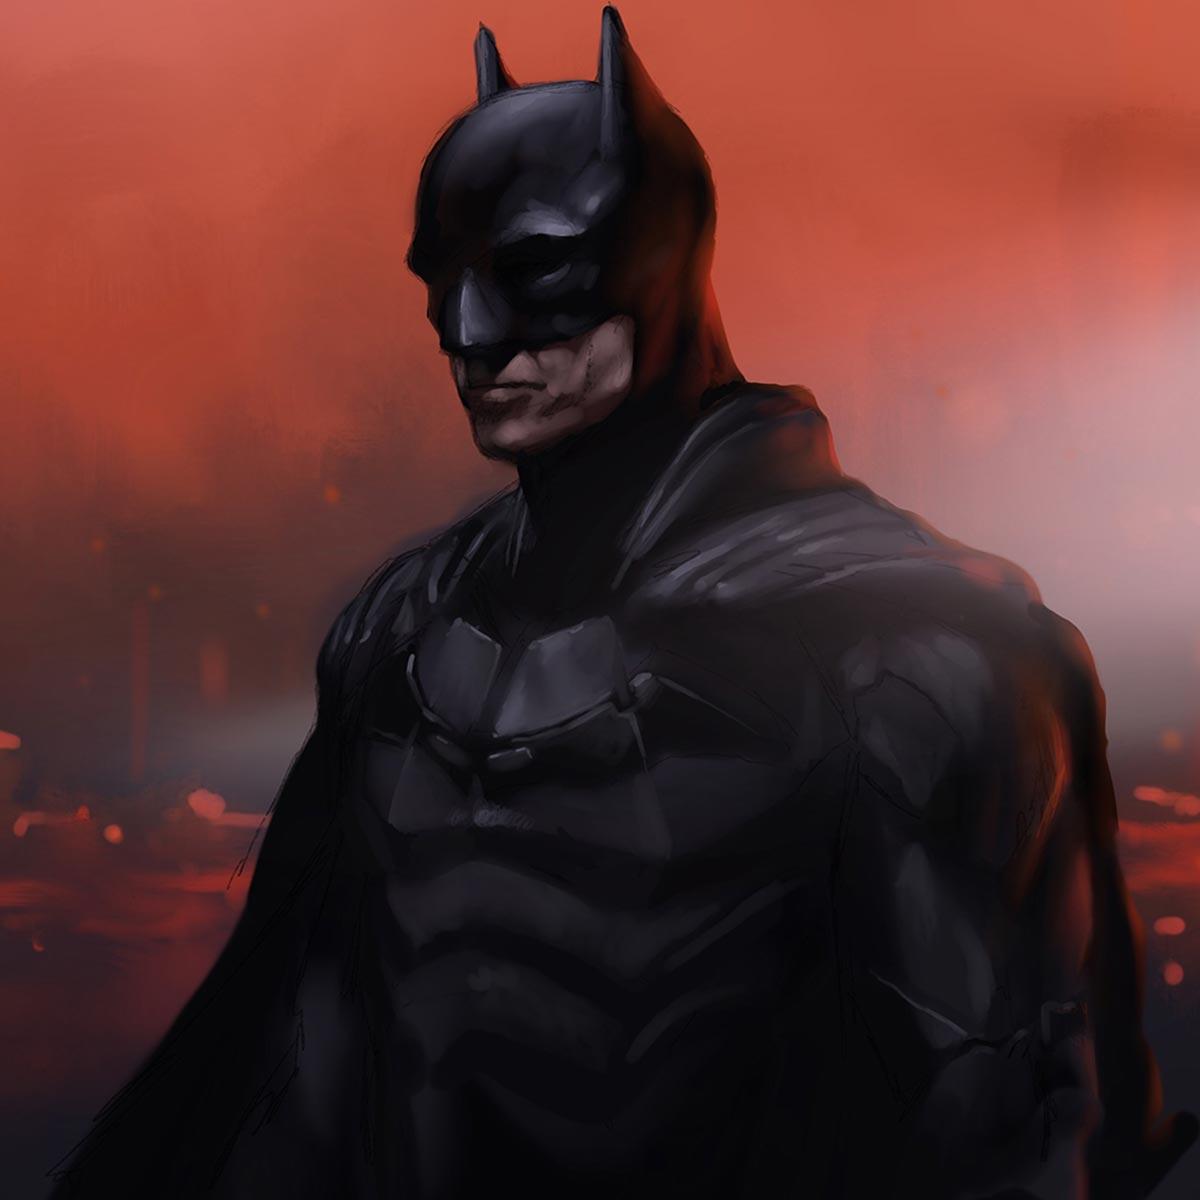 The Batman in Procreate